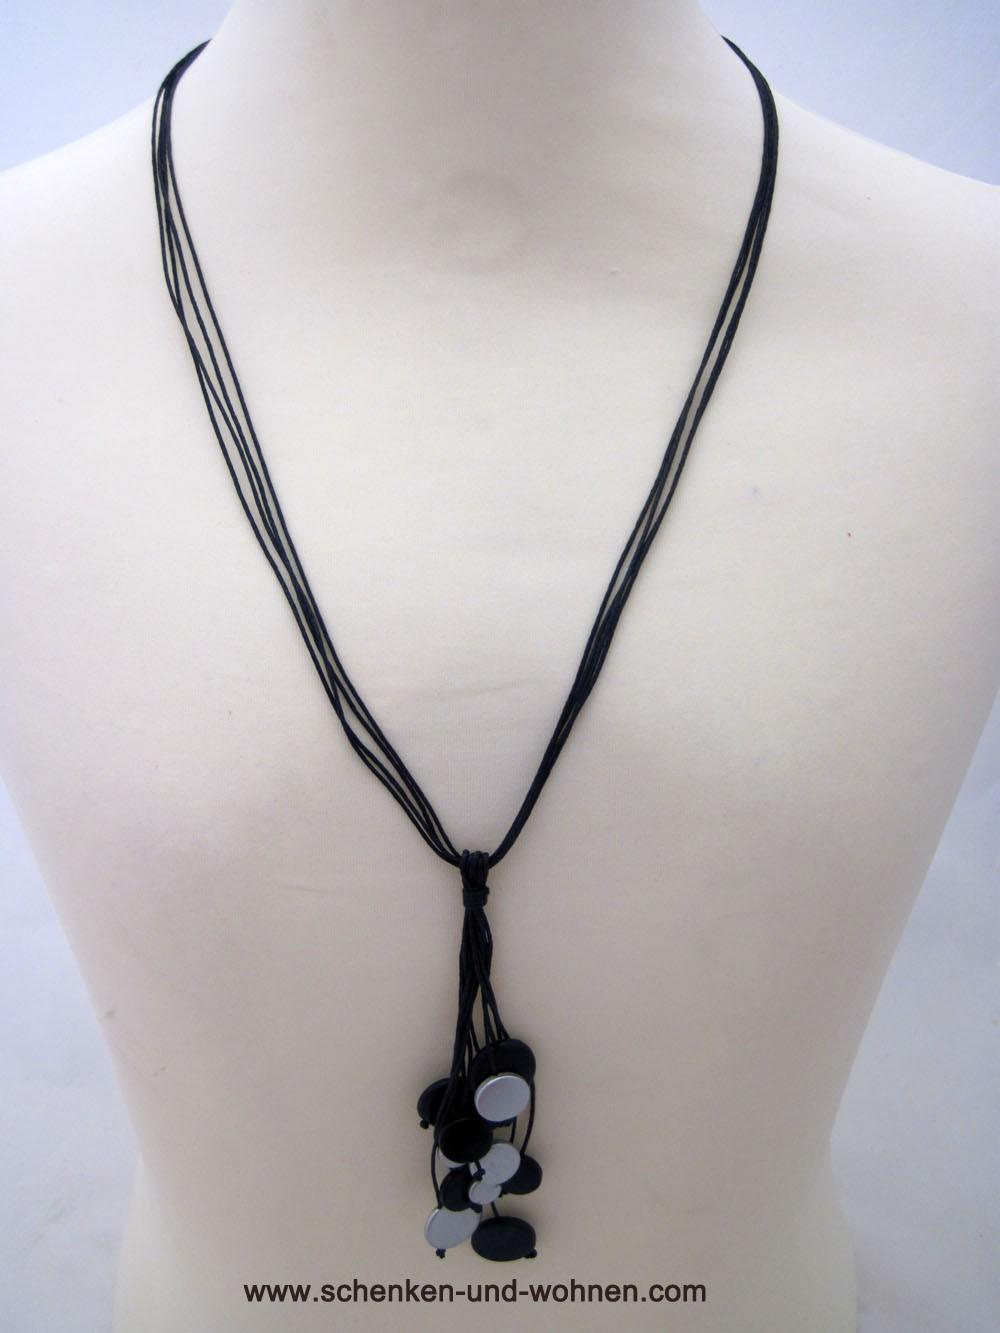 Kette Modeschmuck Länge ca. 46 cm schwarz/silber